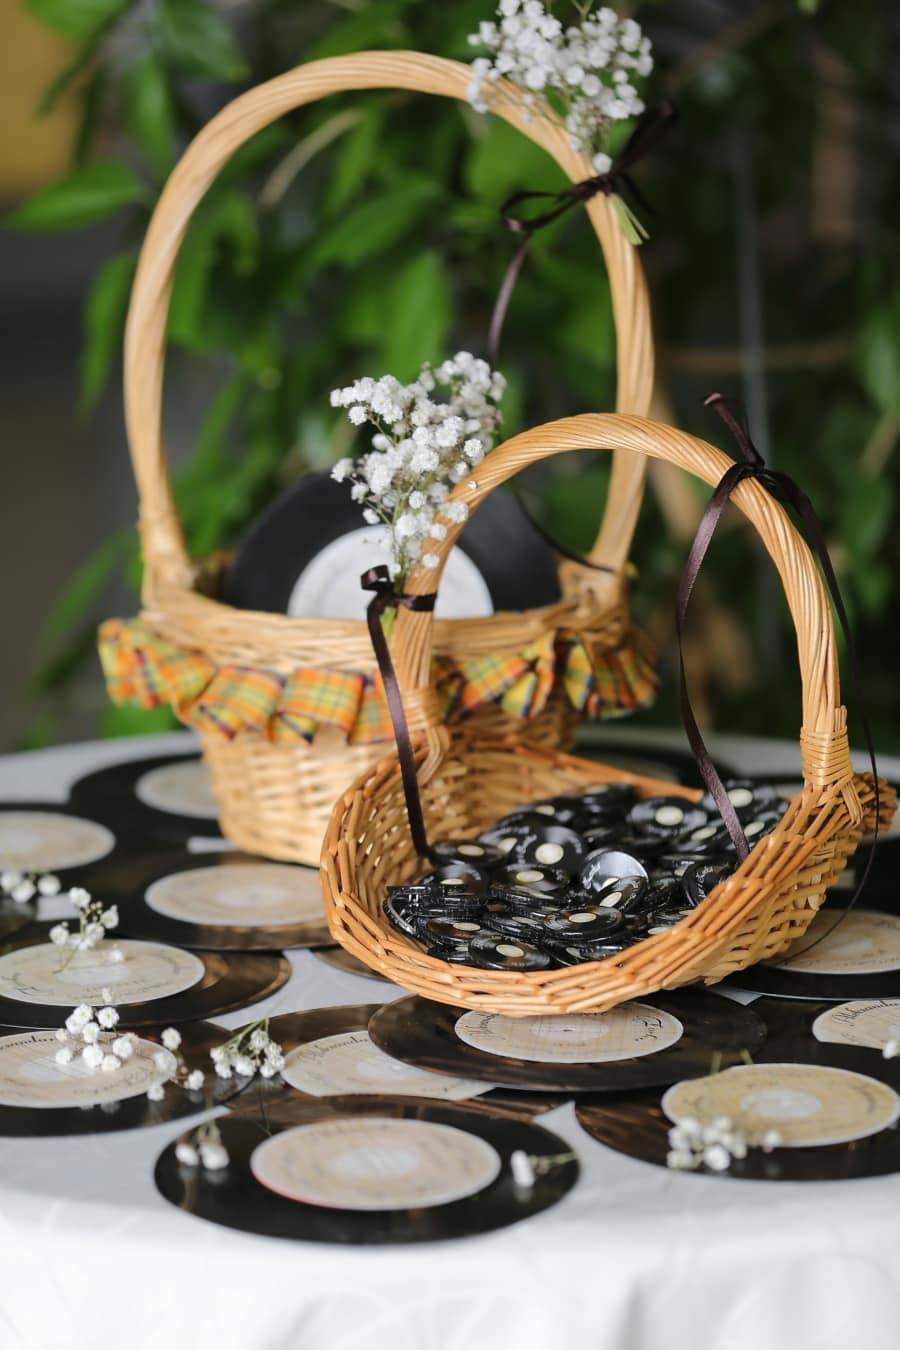 minimalism, memorabilia, vinyl plate, miniature, nostalgia, wicker basket, decoration, arrangement, wood, basket